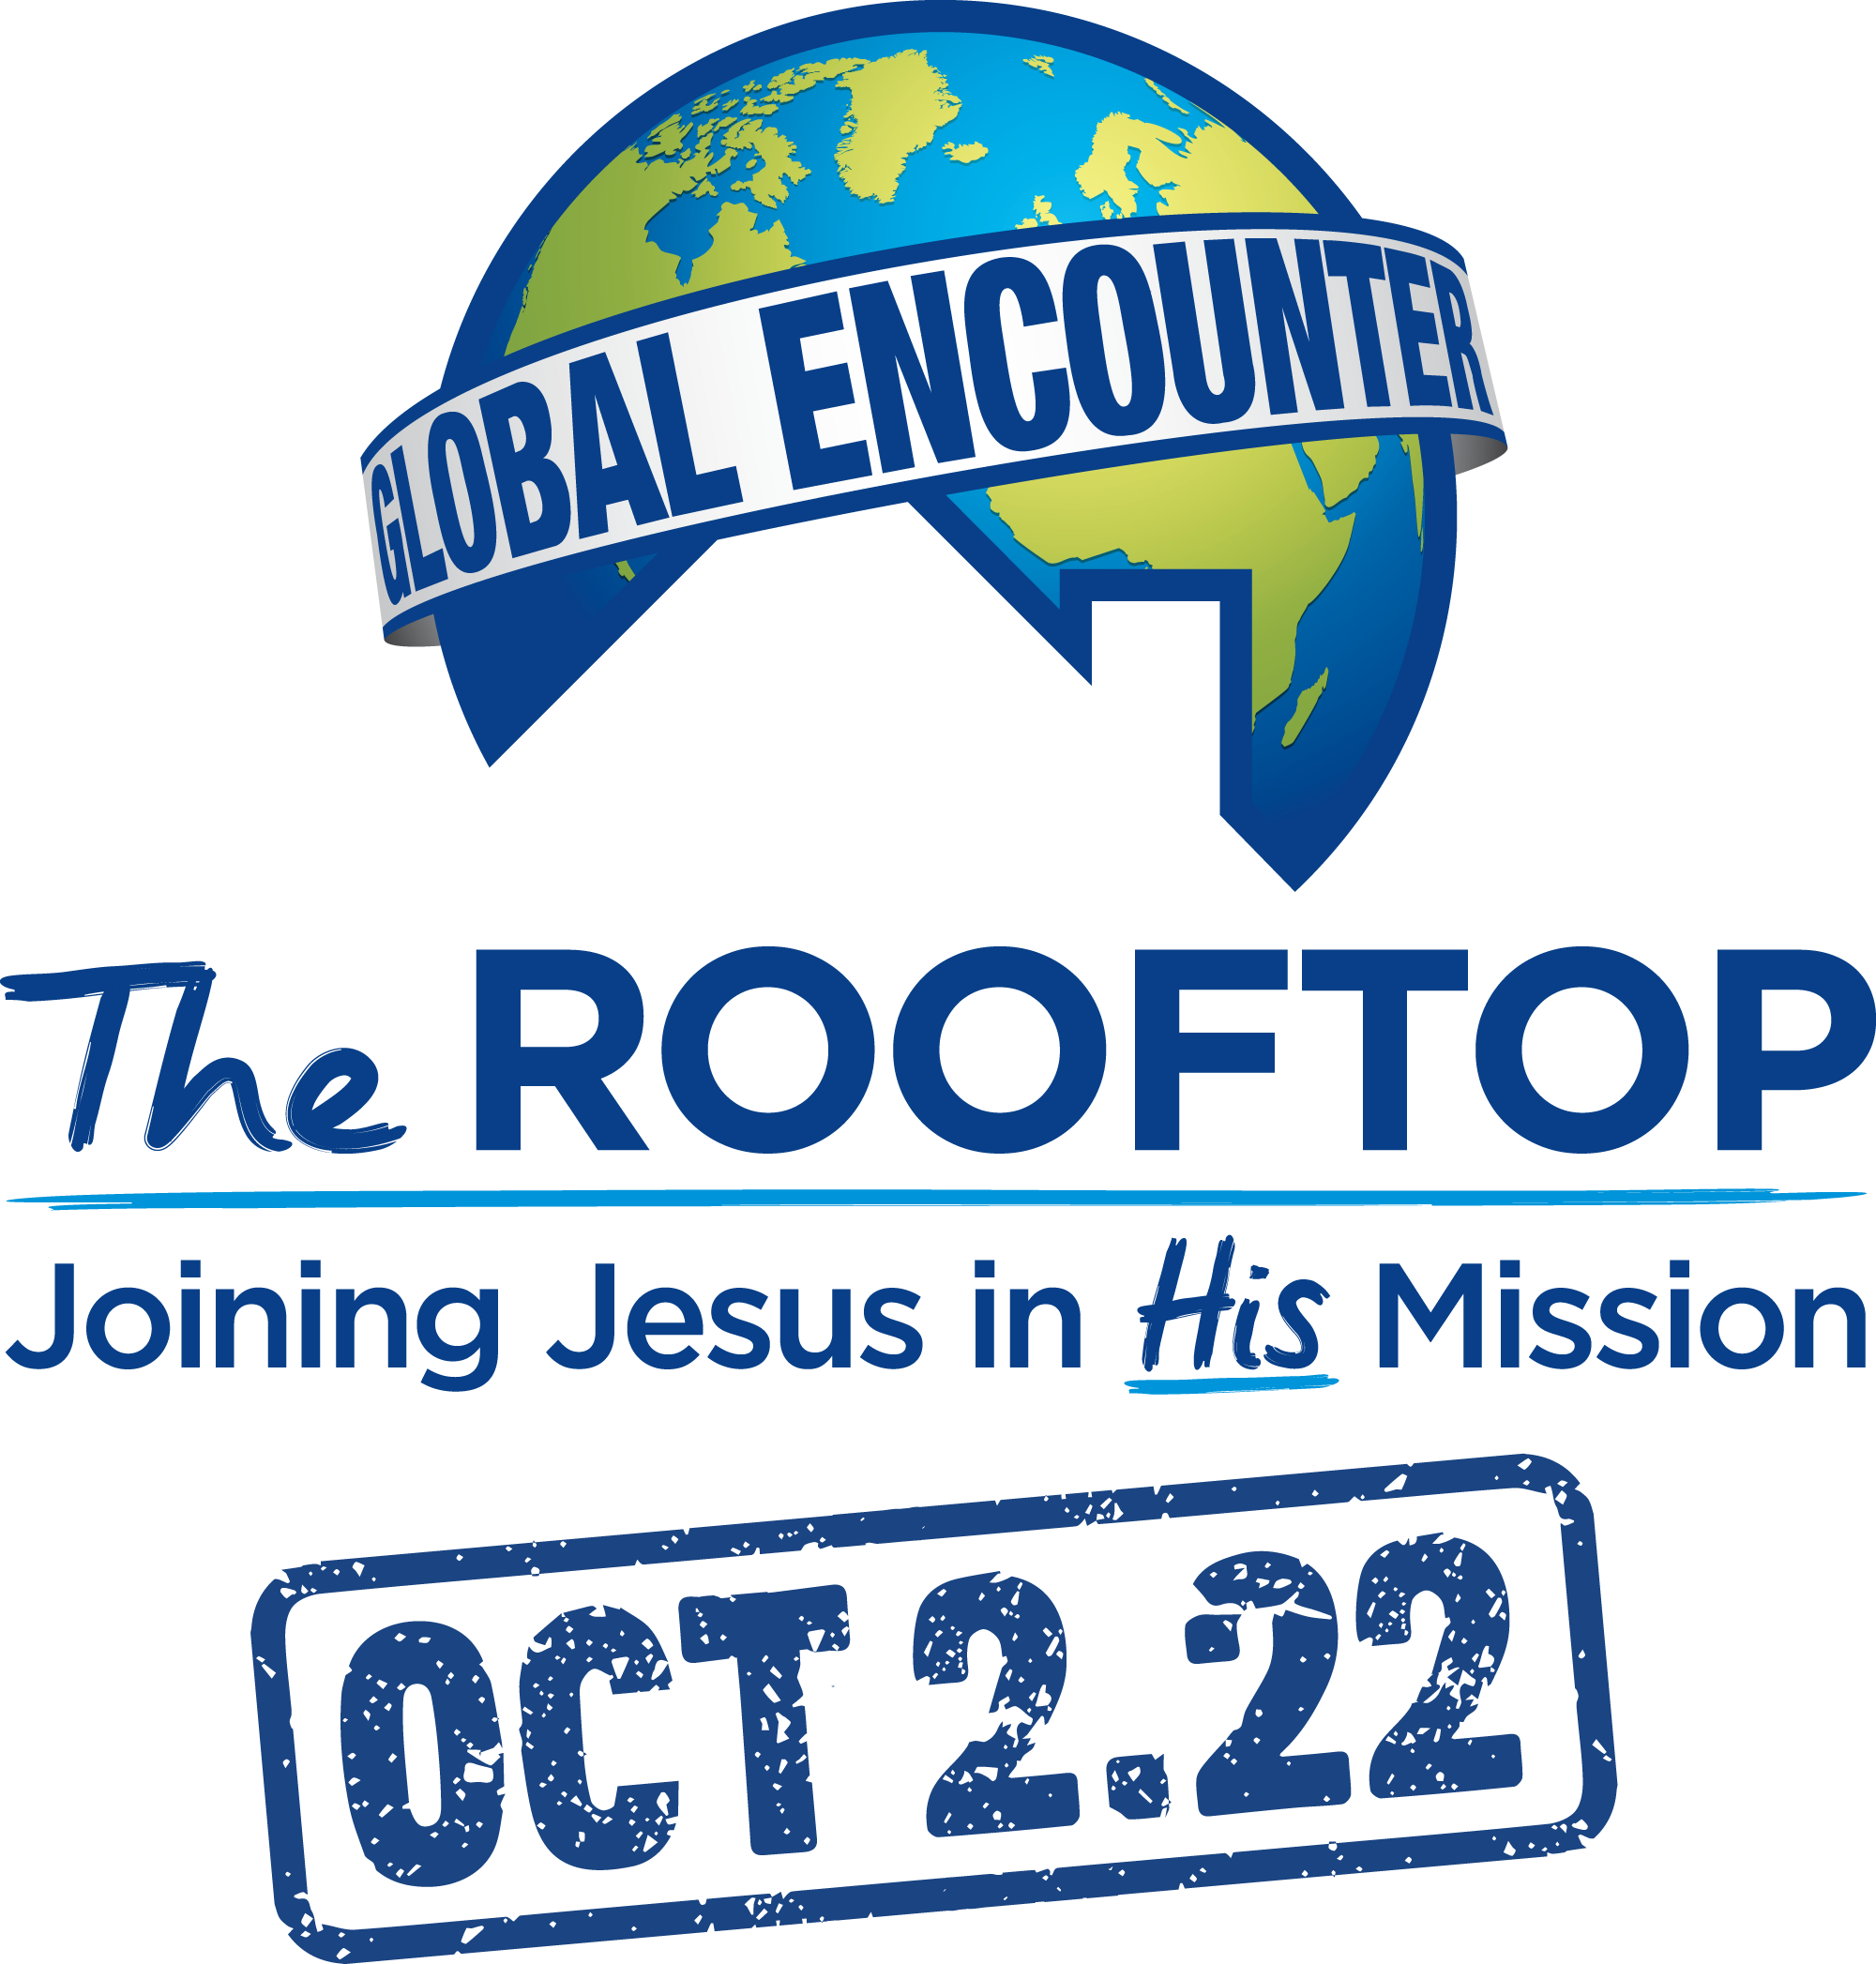 Rooftop Global Encounter